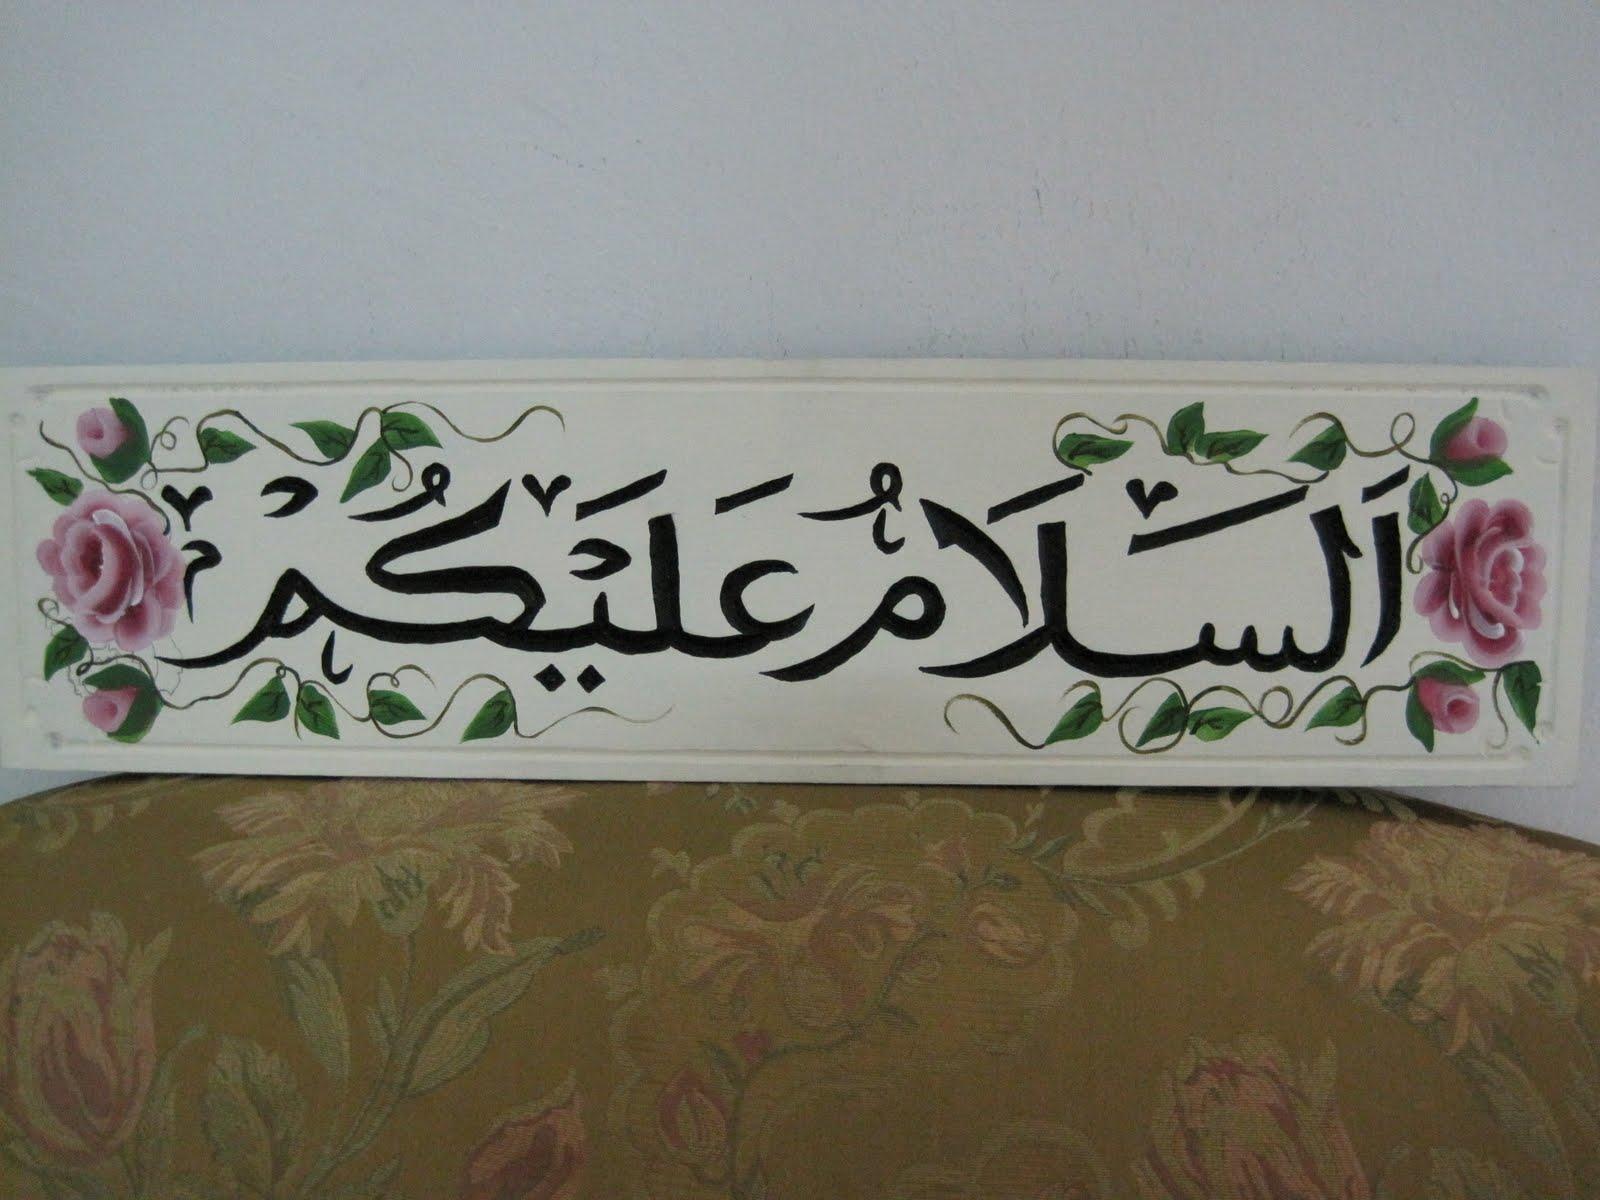 English Deco Loverzzz: Assalamualaikum Signage - Belum Siap